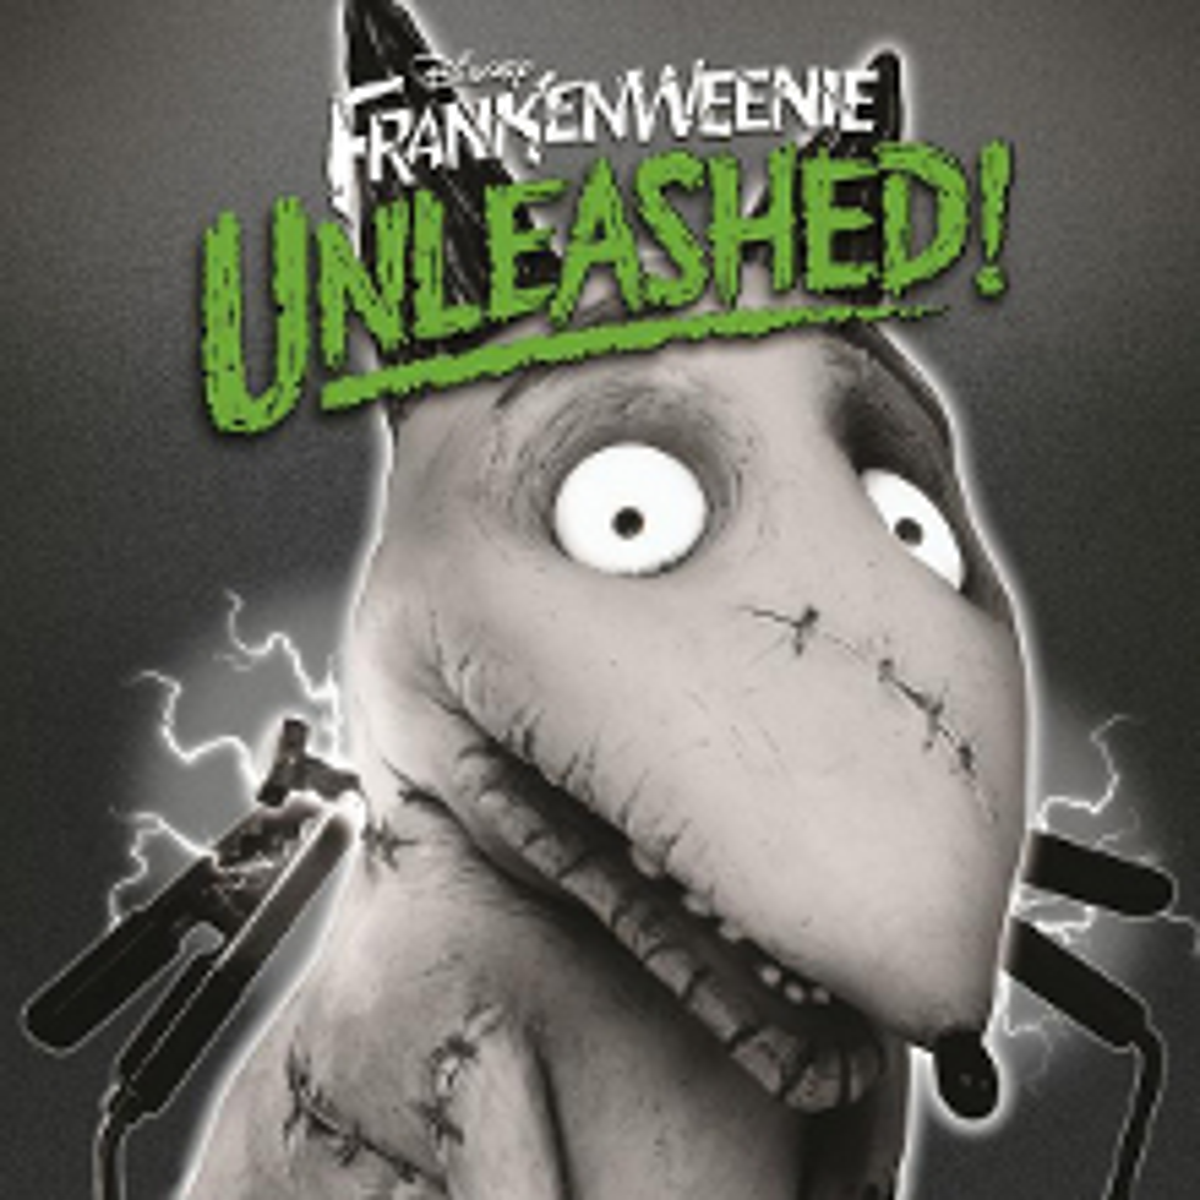 Frankenweenie Unleashed cover artwork